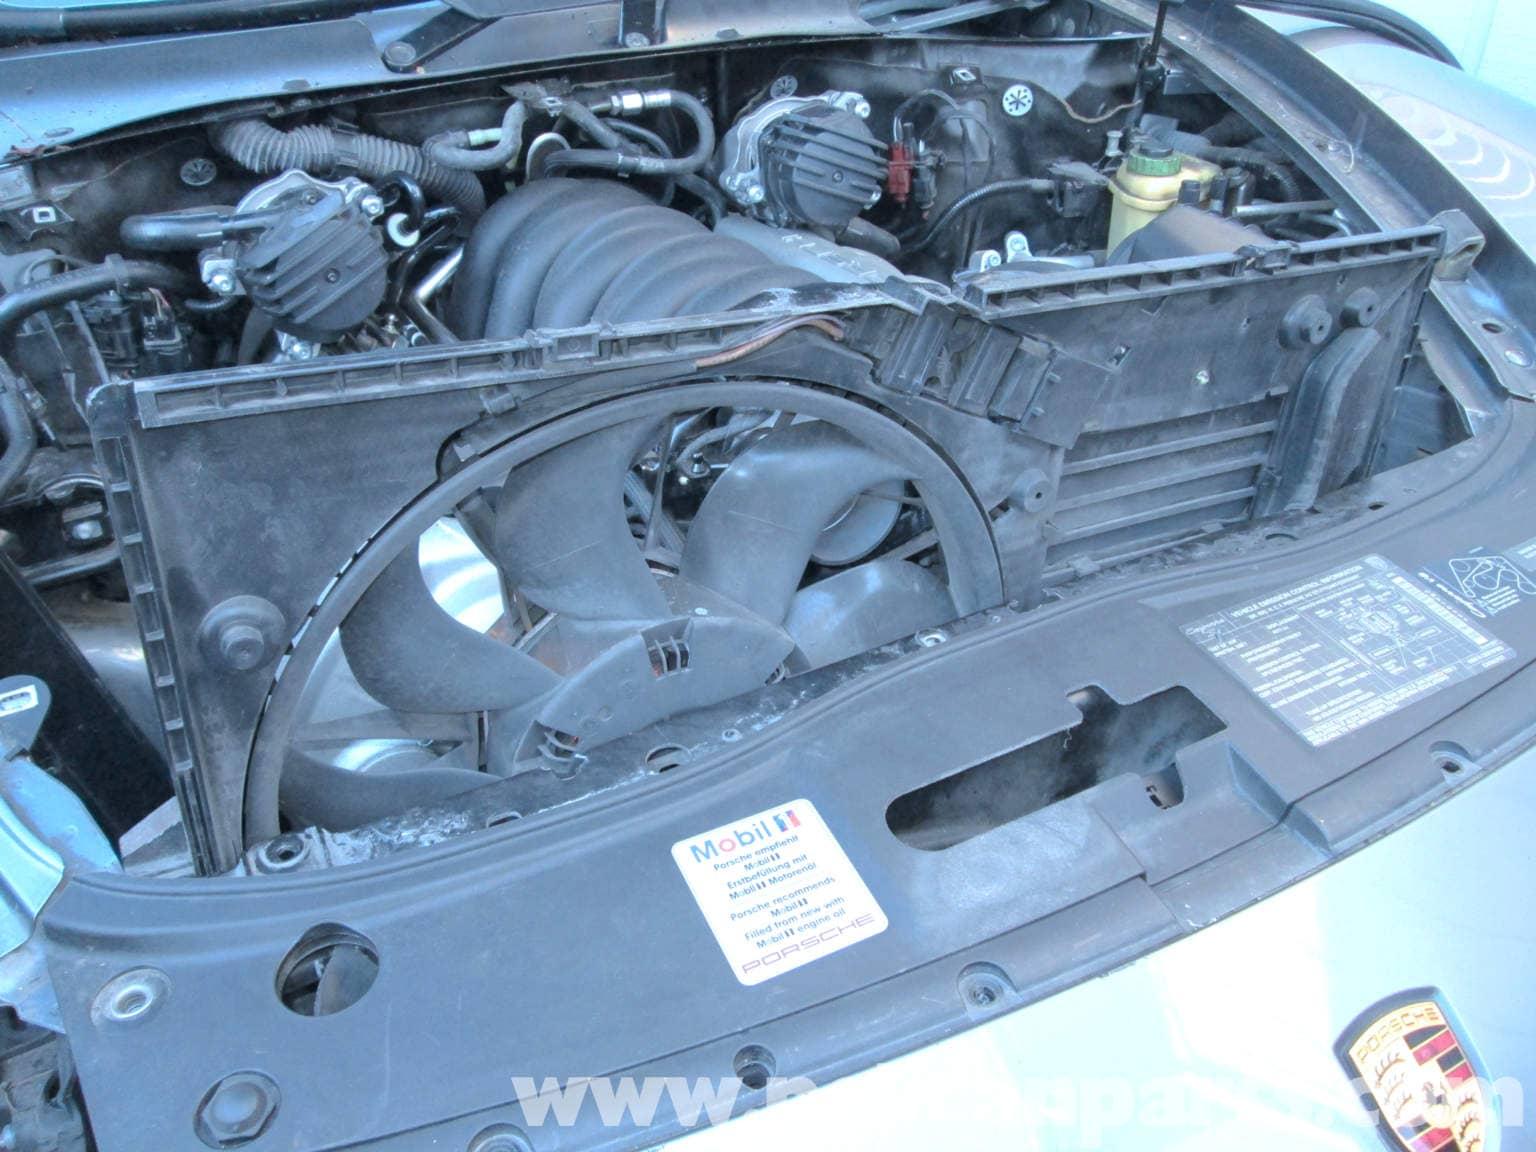 Porsche Cayenne Radiator Fan Replacement 2003 2008